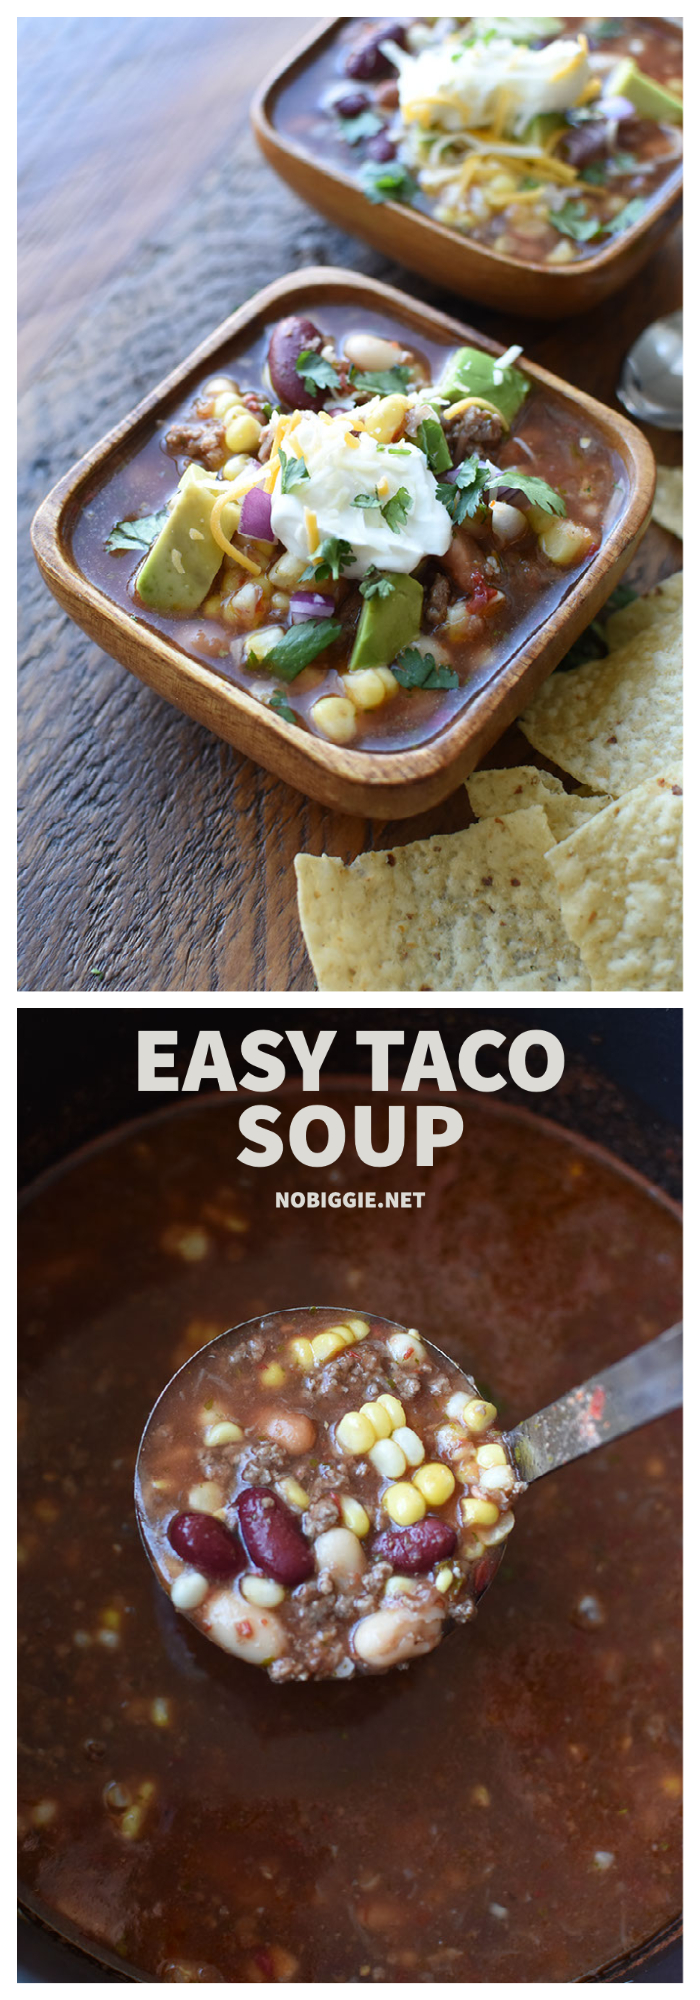 Easy Taco Soup | NoBiggie.net